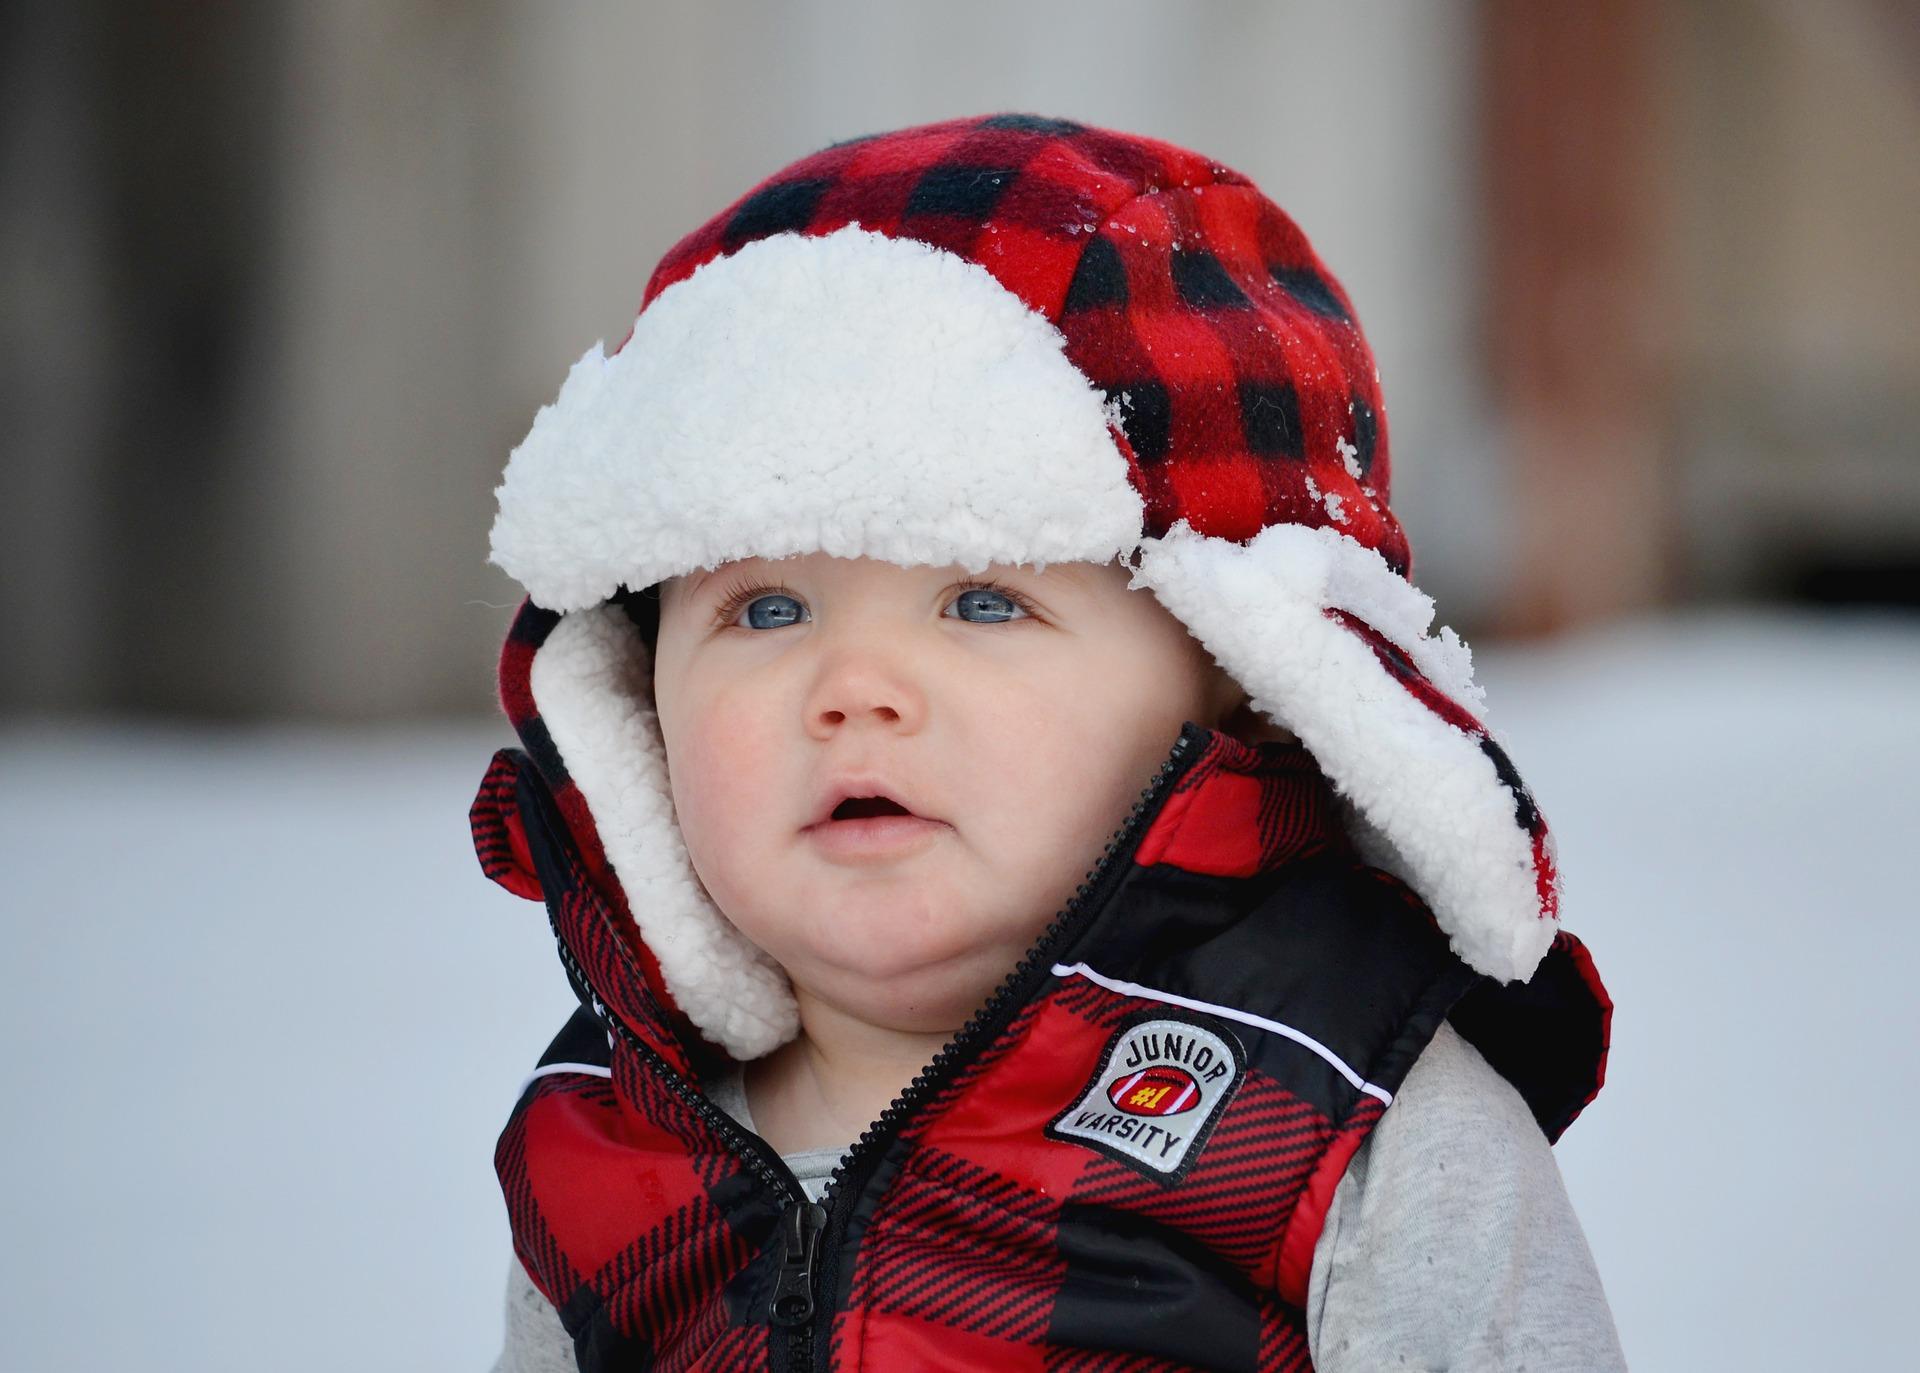 snow-baby-2073353_1920.jpg